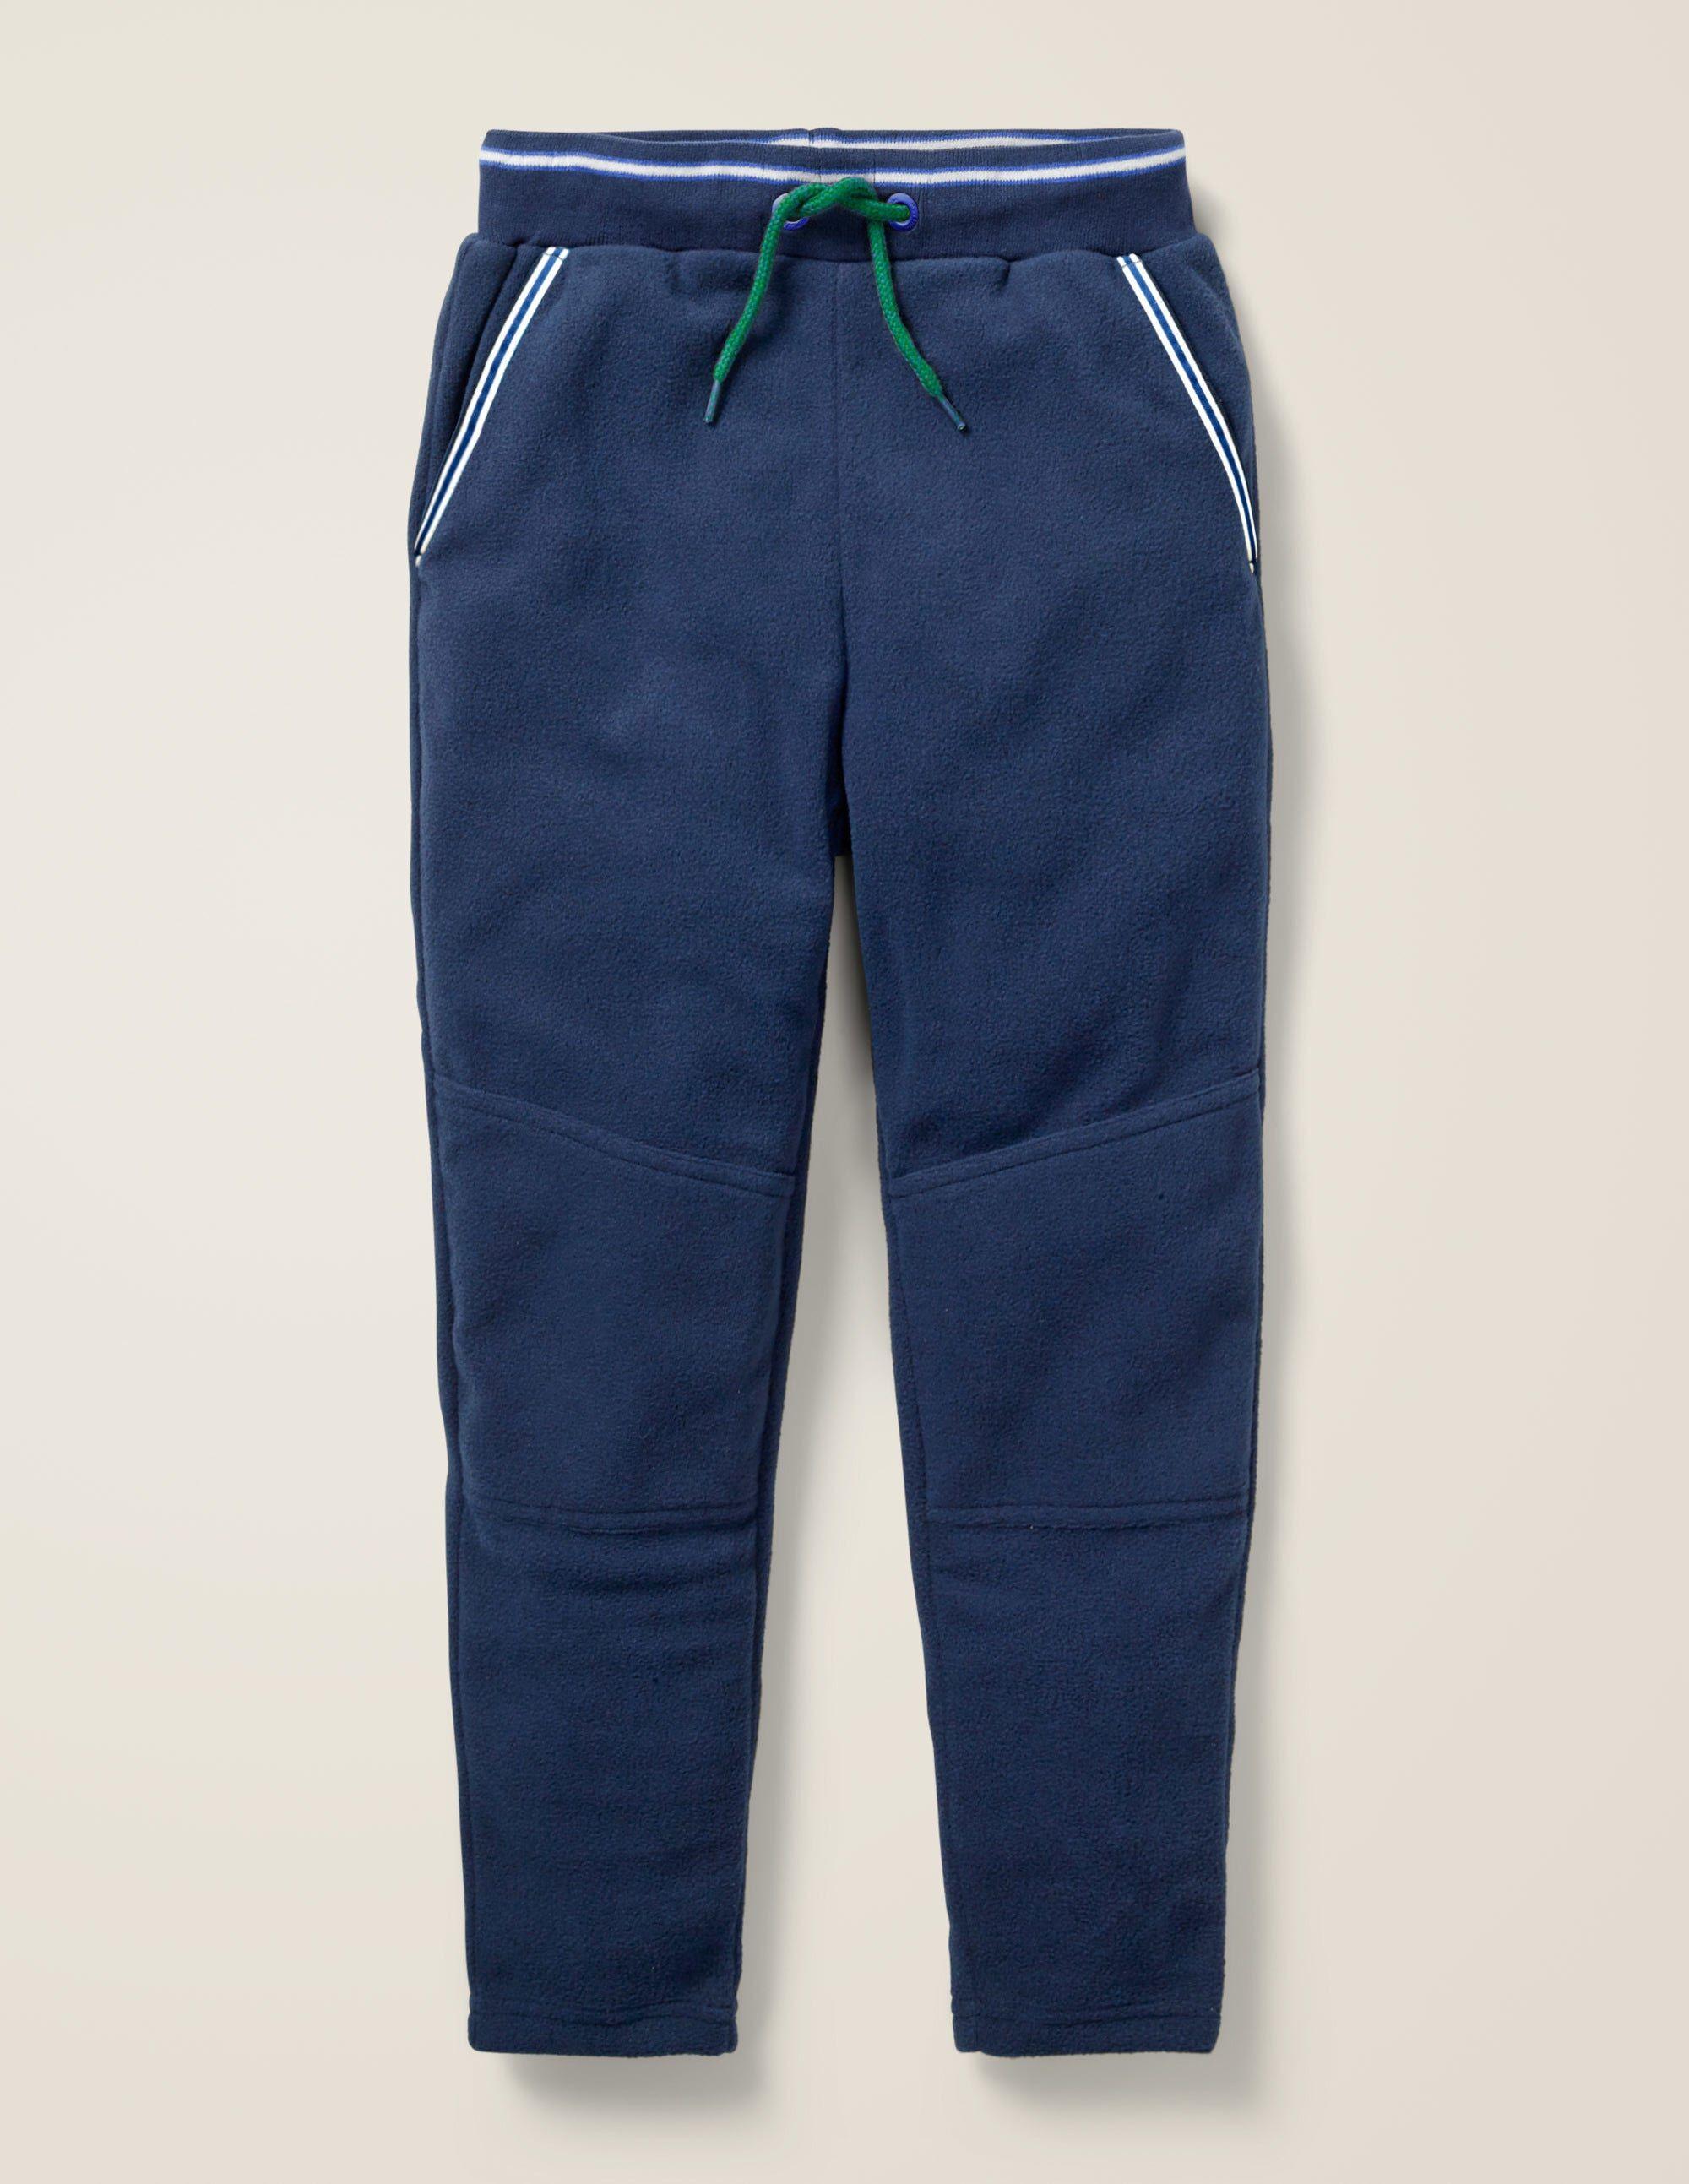 Mini Pantalon de survêtement en micro-polaire BLU Garçon Boden, Blue - 7a